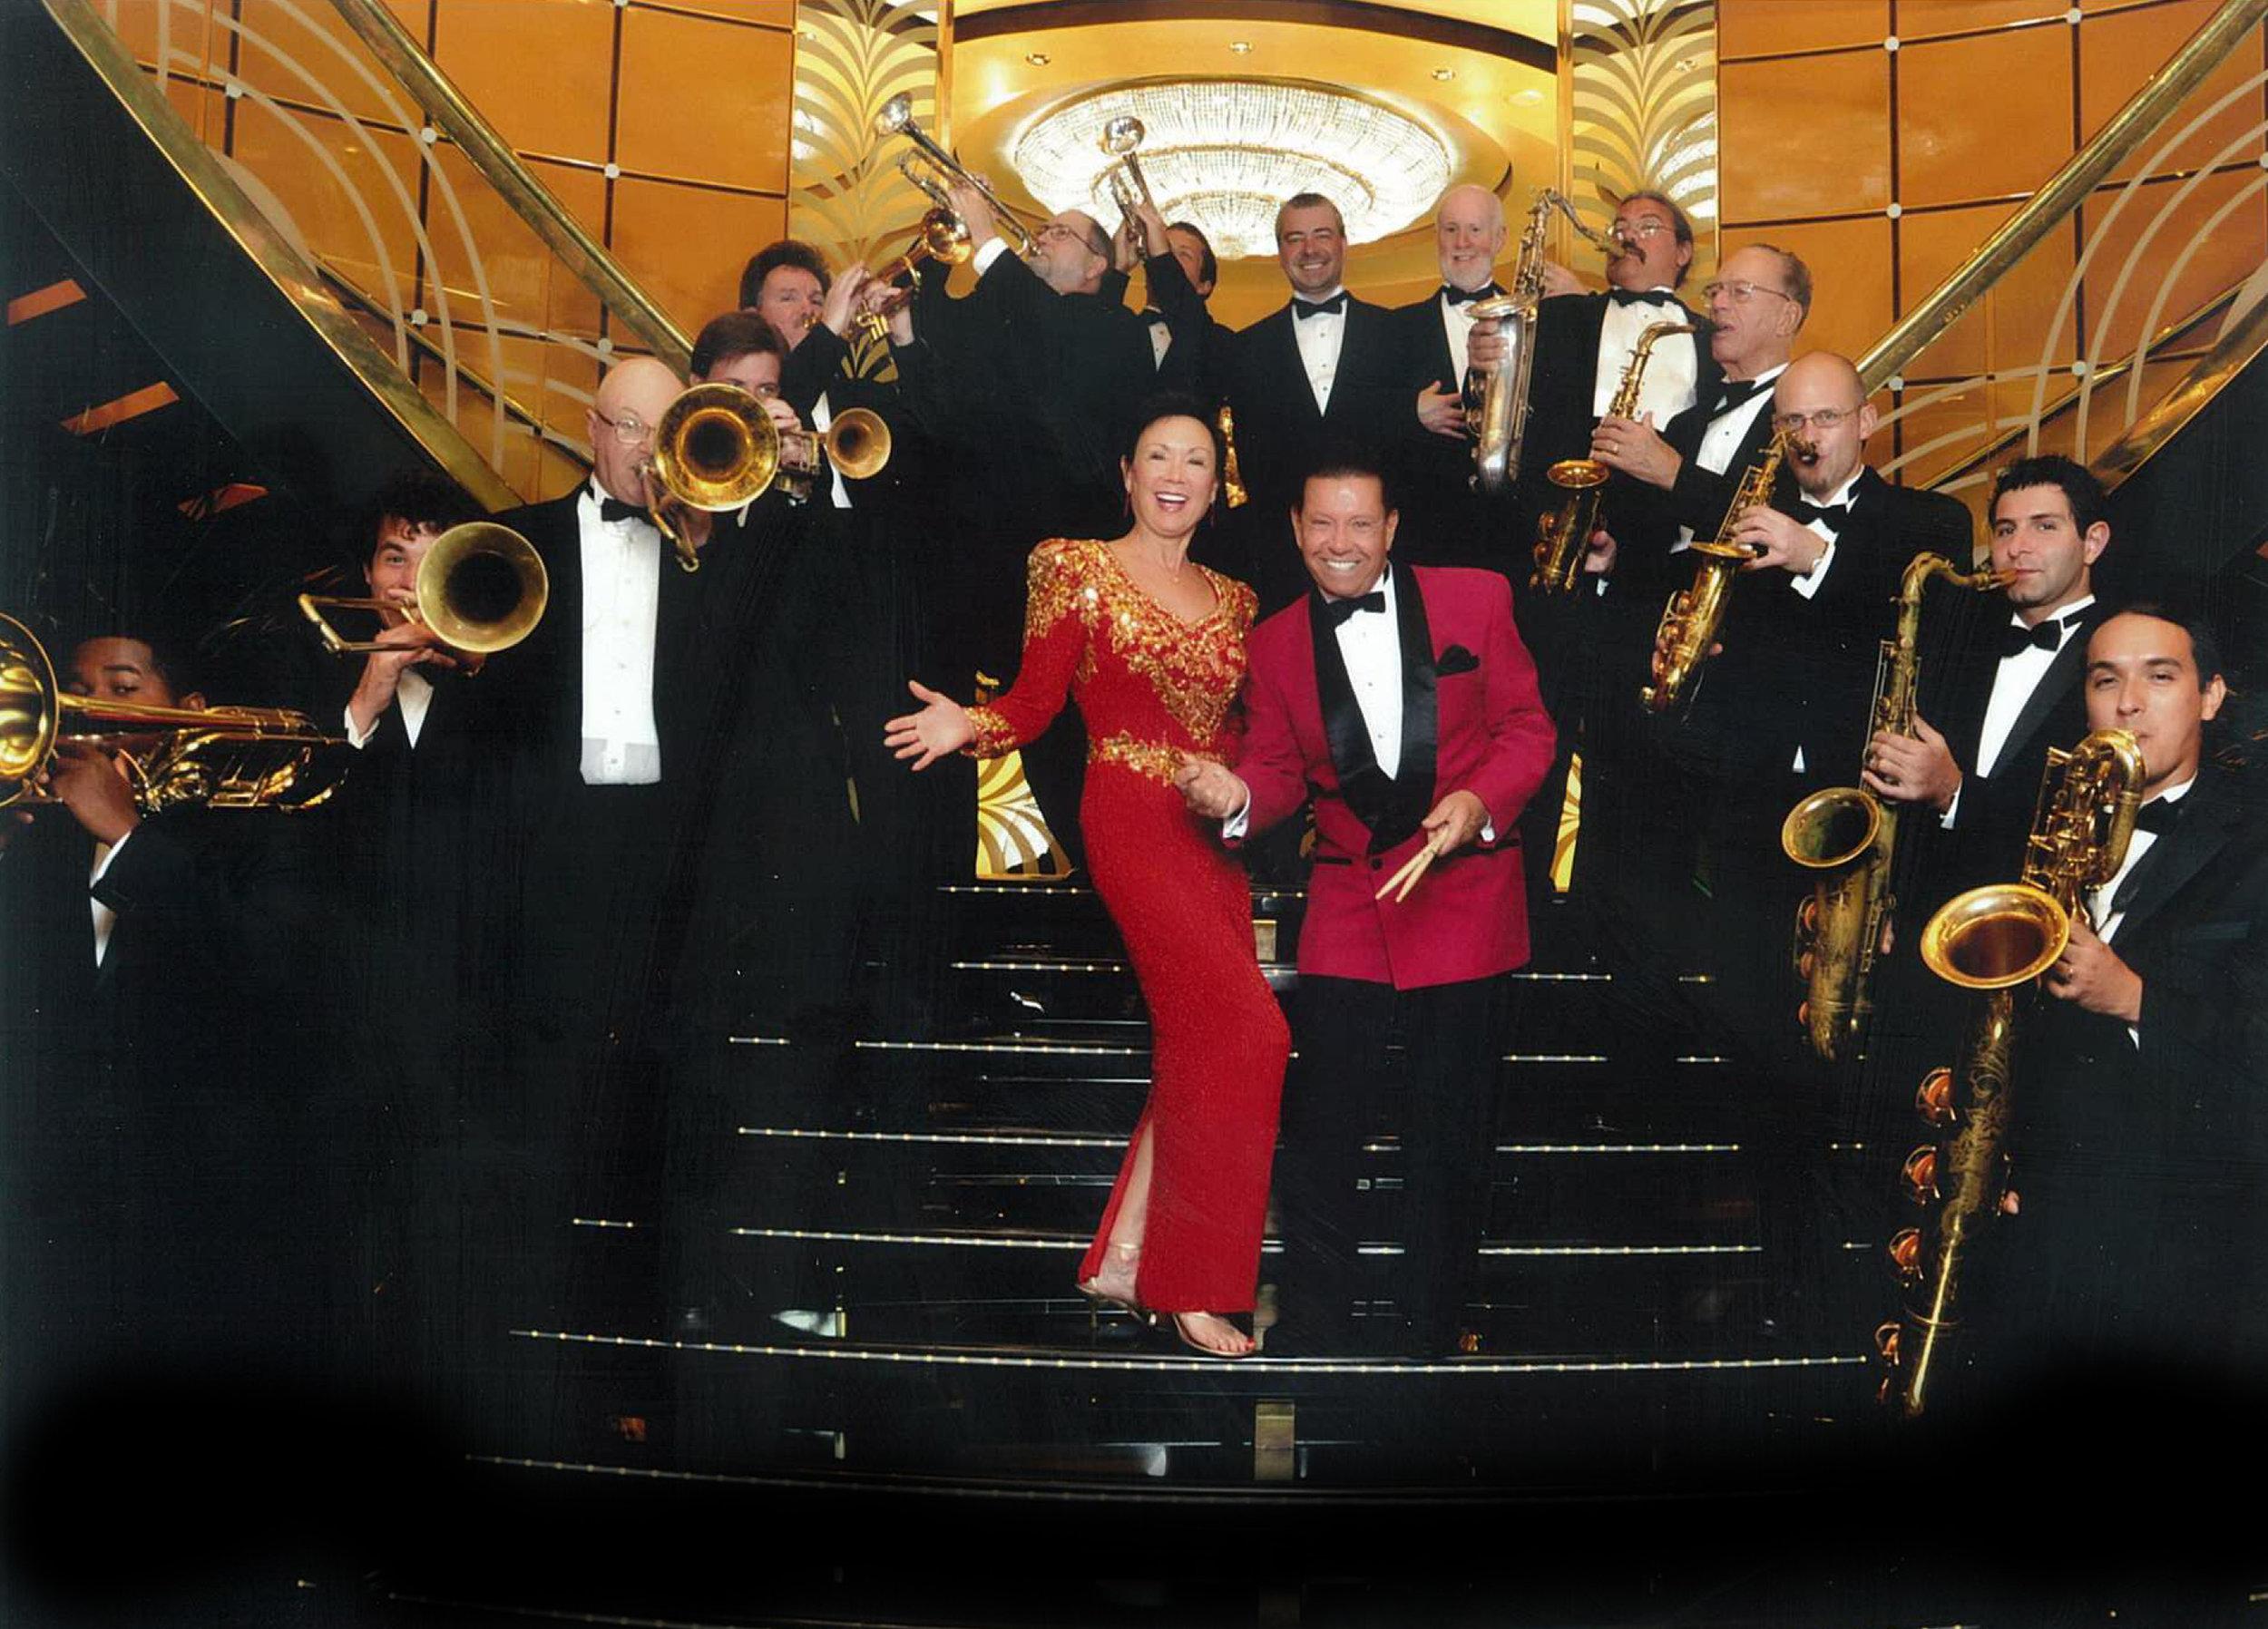 The Dynamic Les DeMerle Big Band    featuring Bonnie Eisele